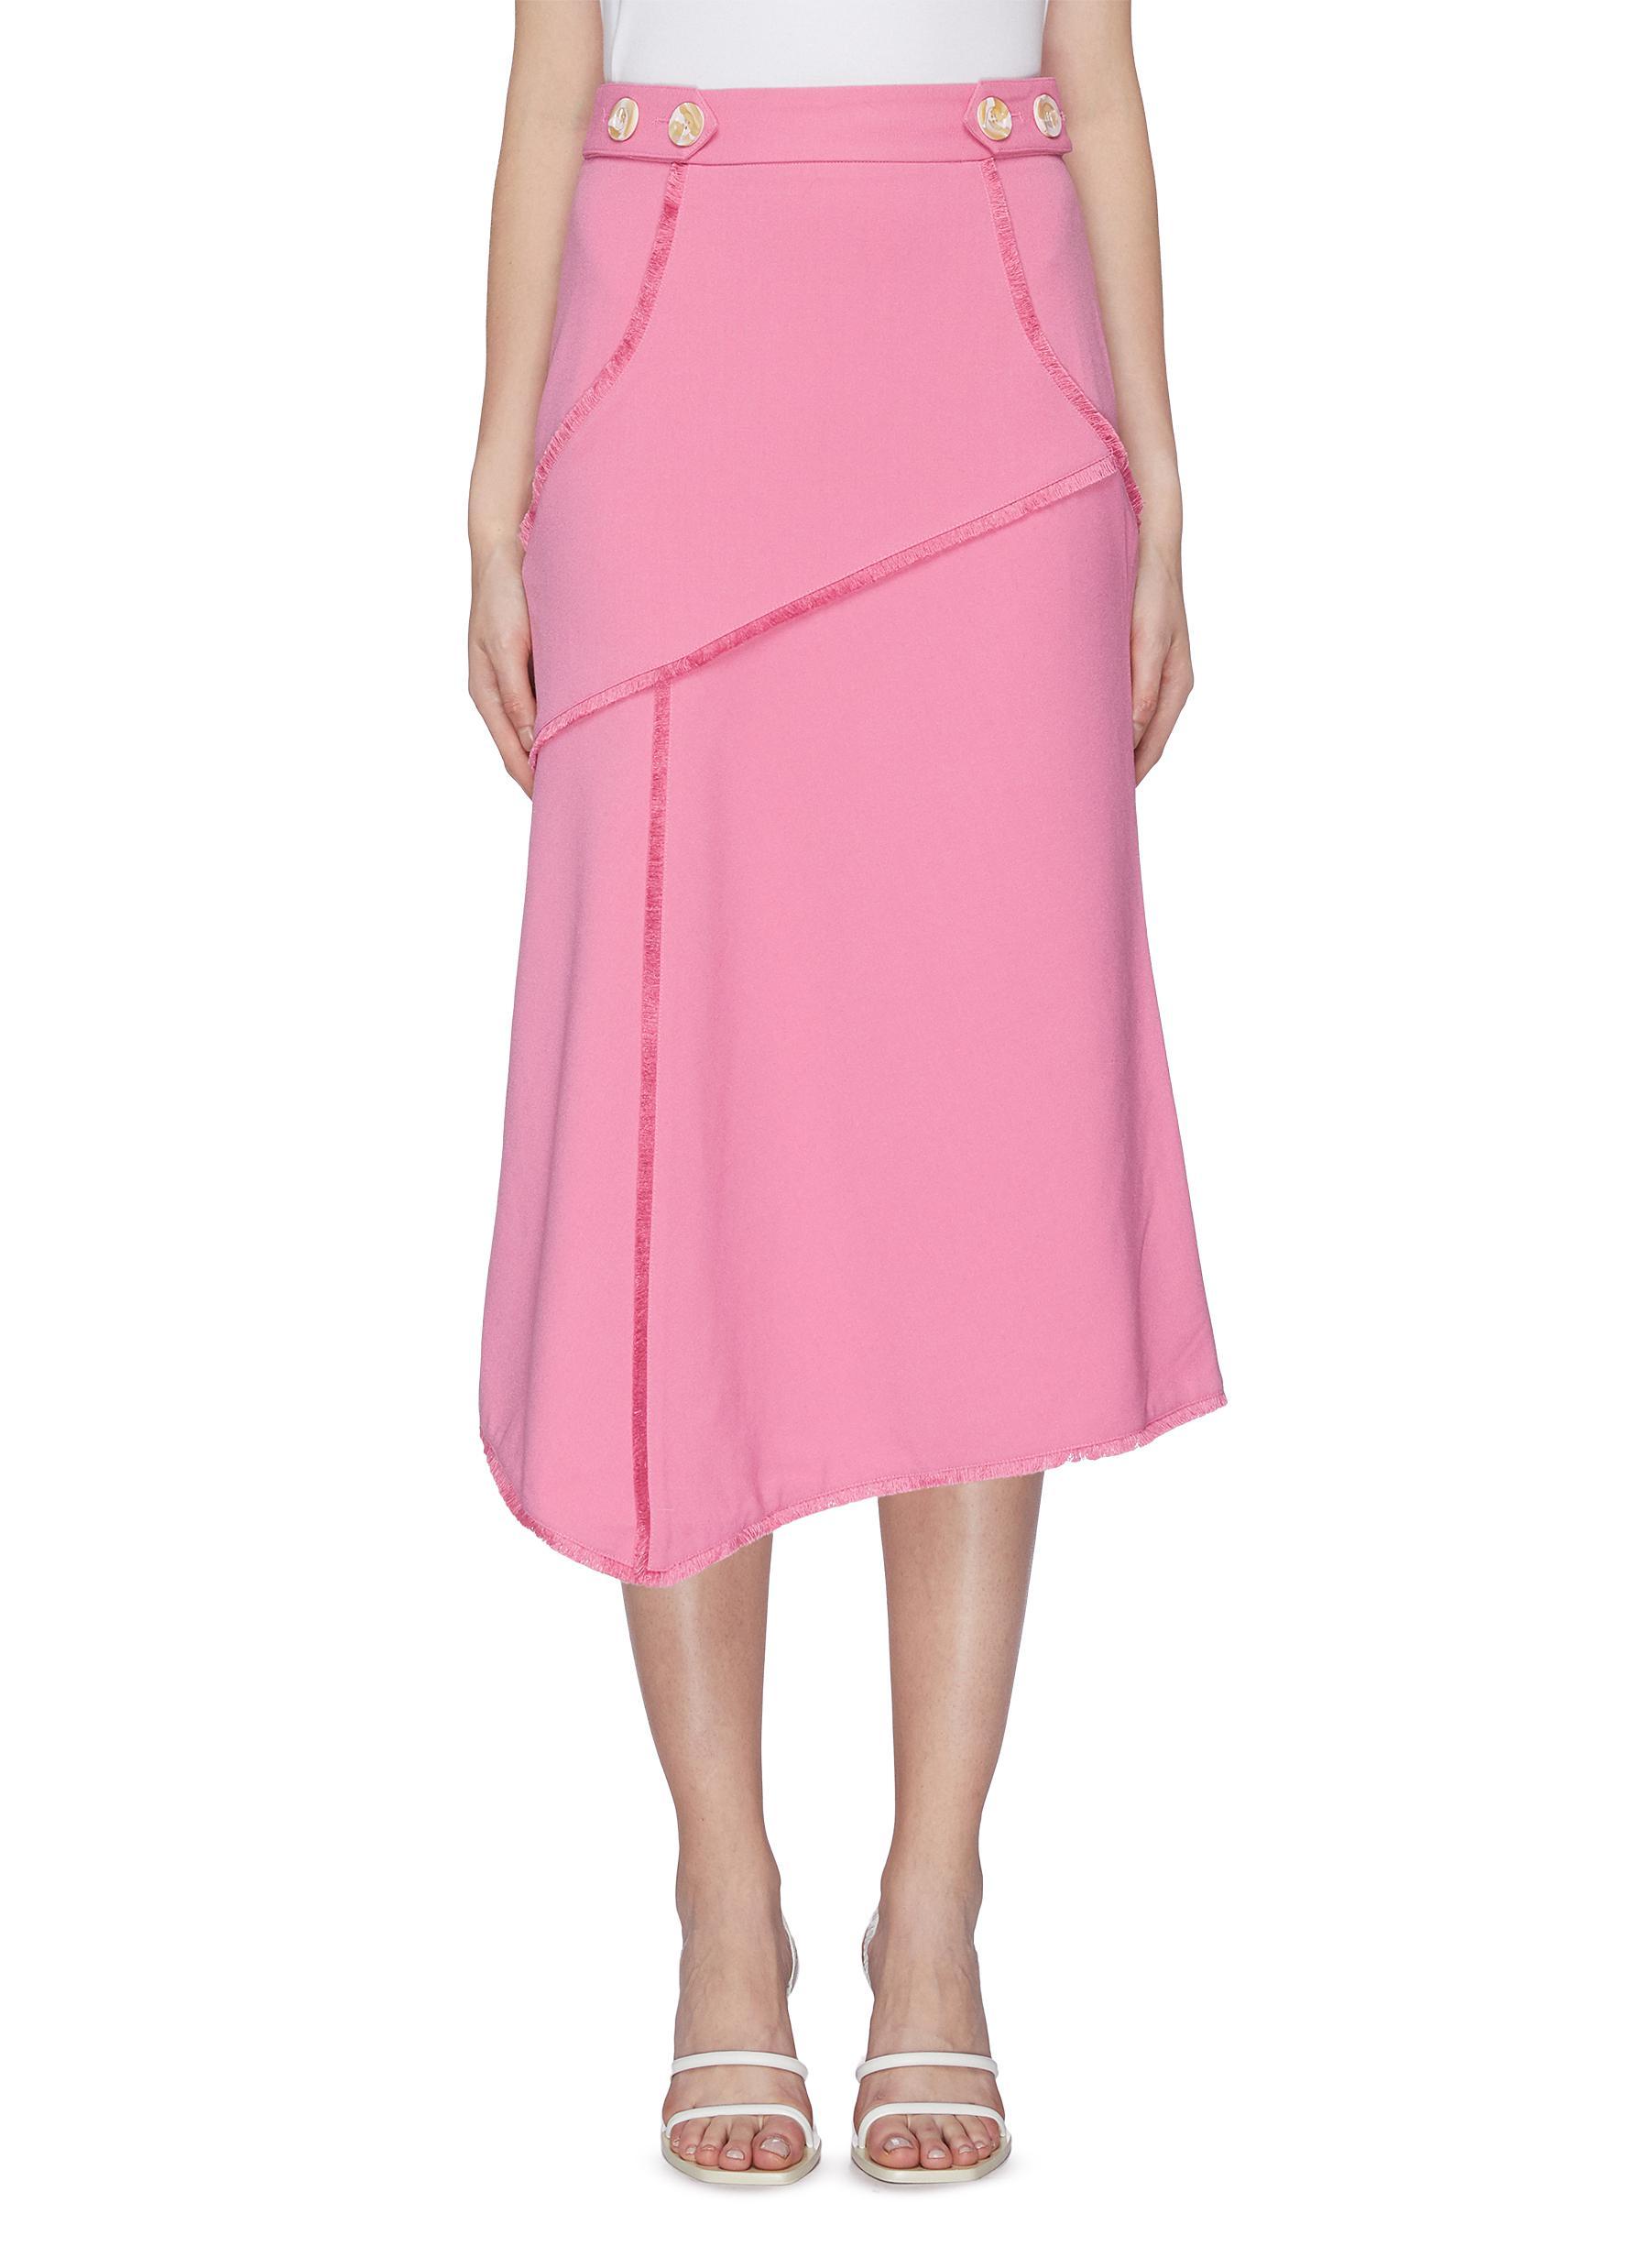 Sienna fringe panelled skirt by Rebecca Vallance